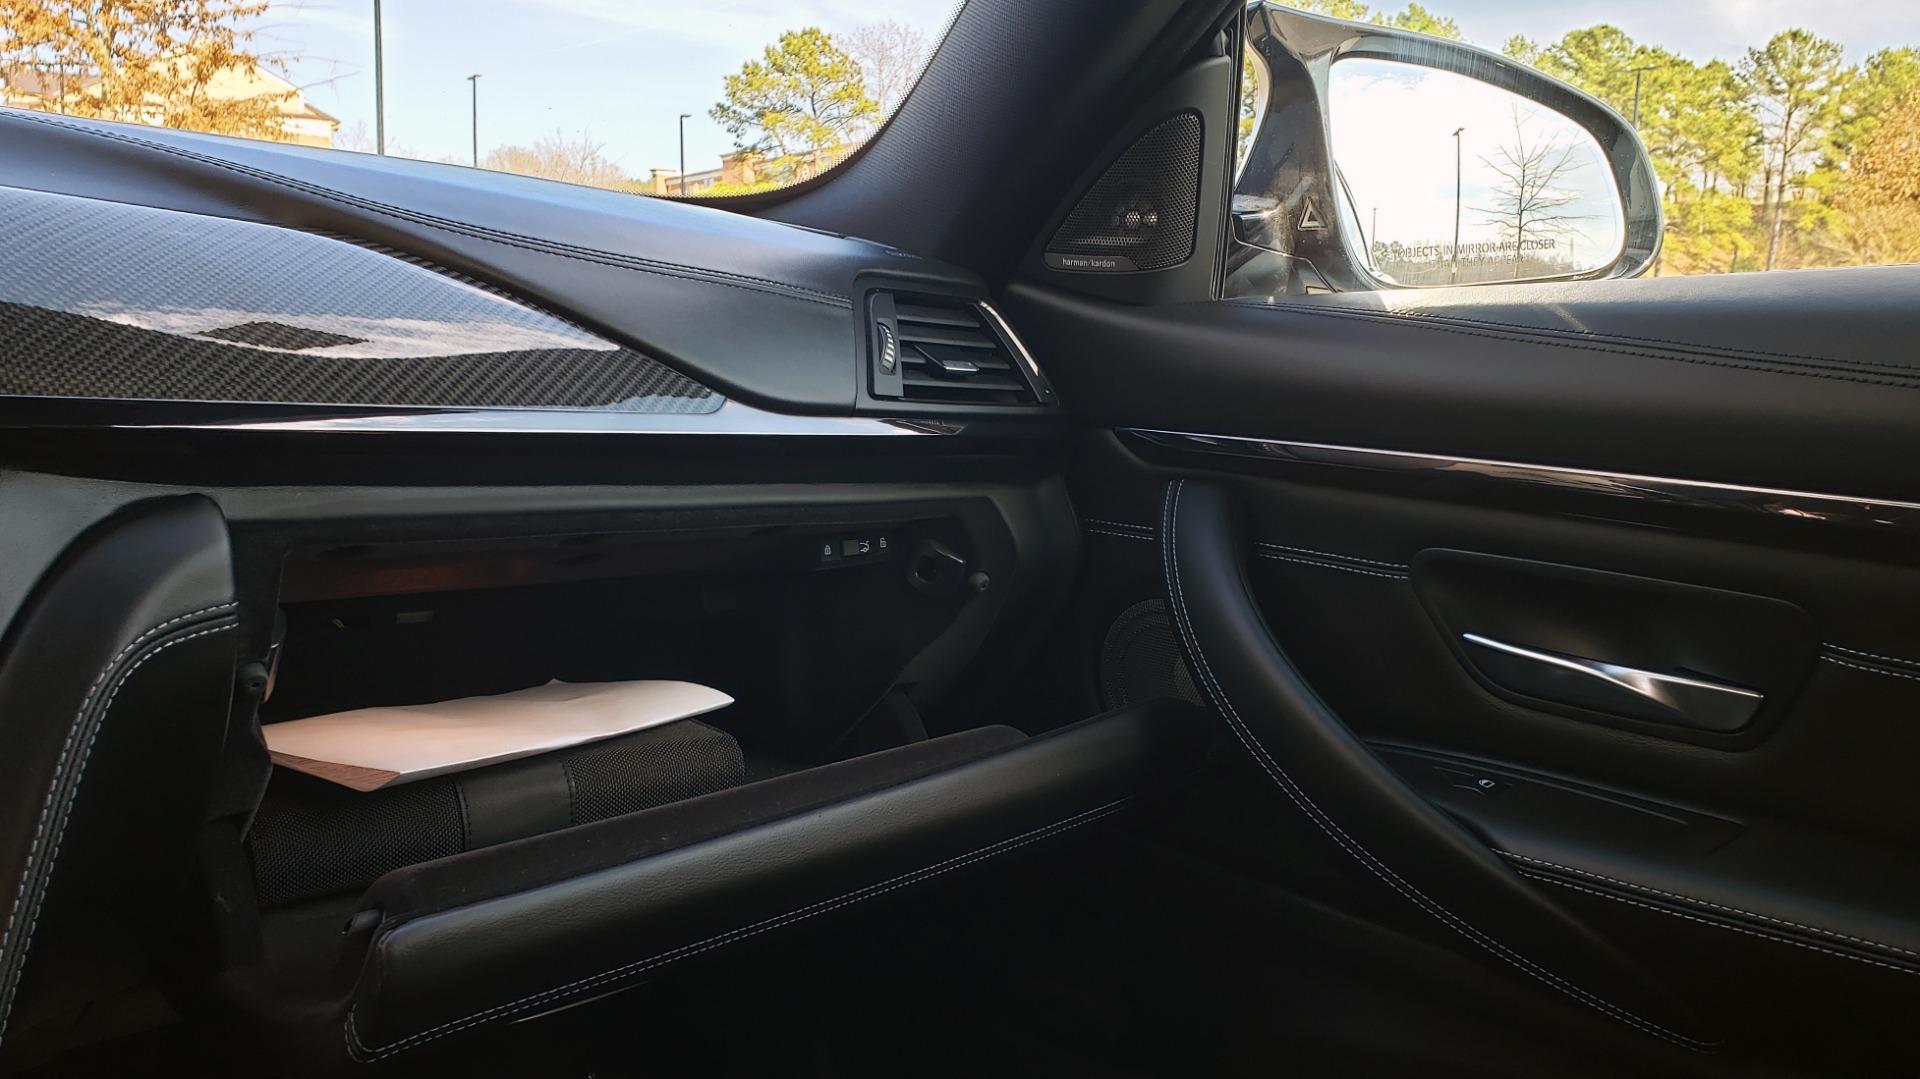 Used 2015 BMW M4 COUPE / EXEC PKG / DRVR ASST PLUS / LIGHTING / M-SUSPENSION for sale Sold at Formula Imports in Charlotte NC 28227 60